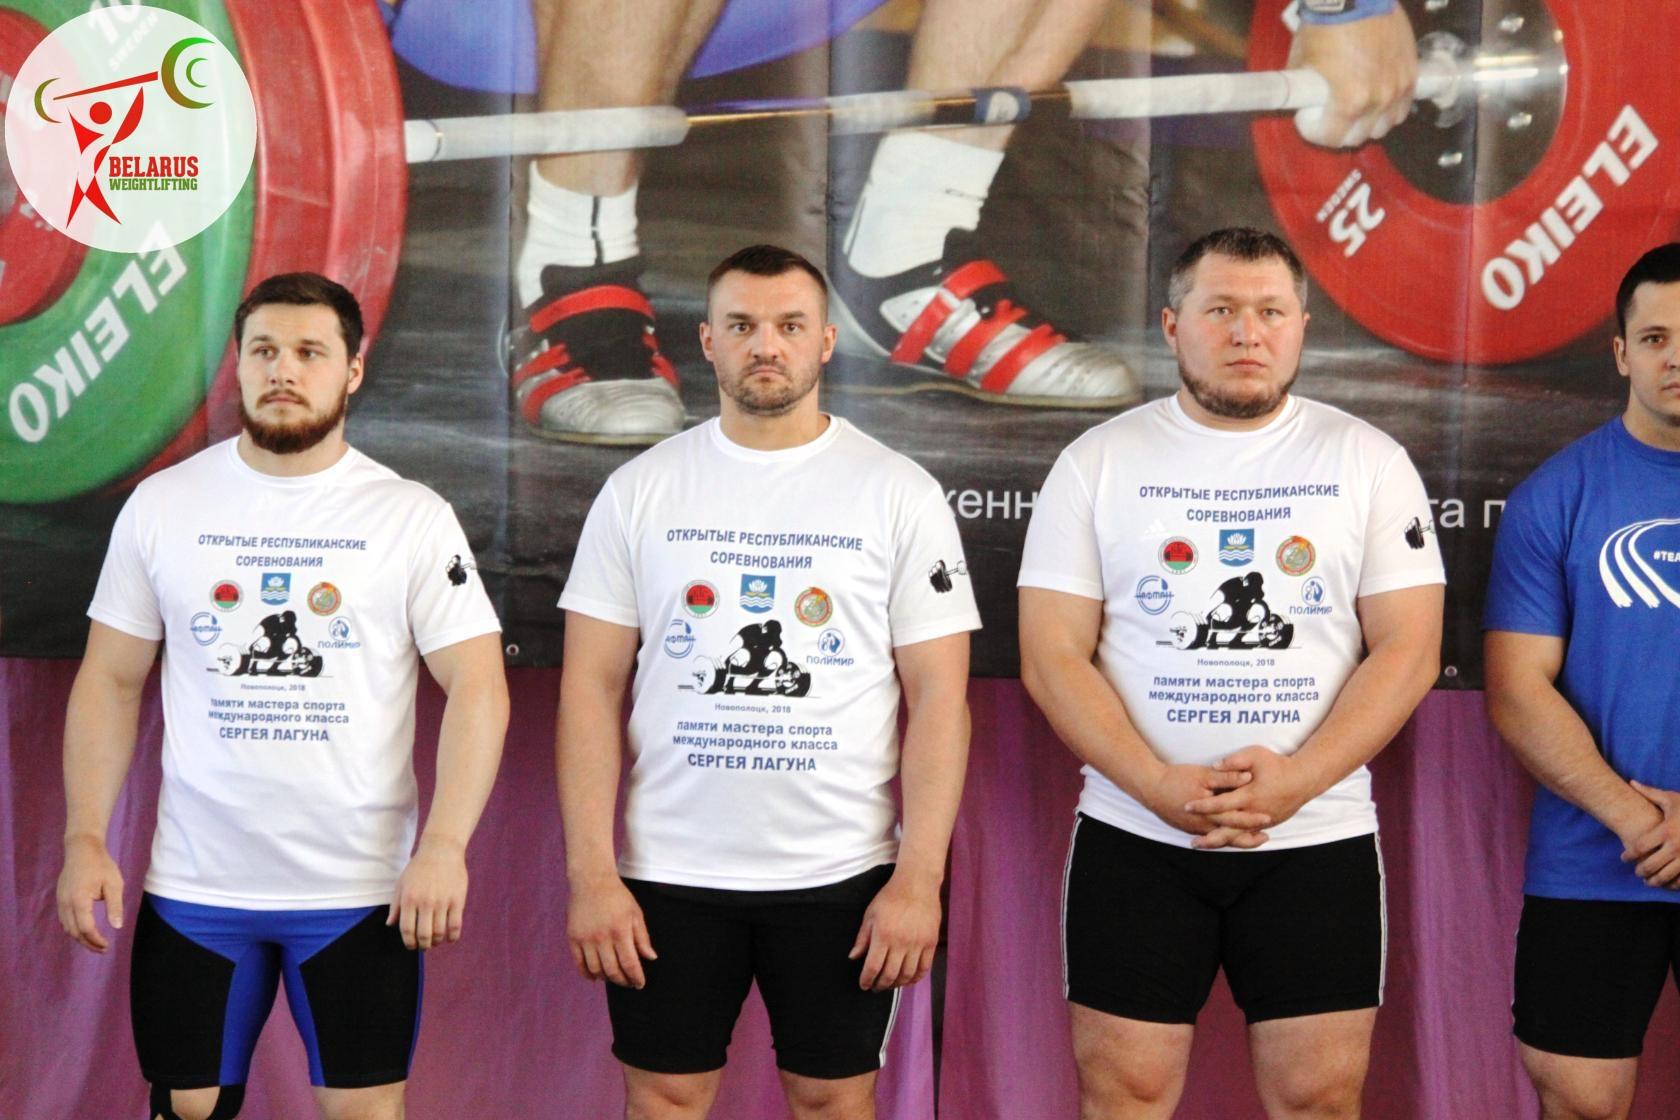 Peter Asaonok, Vadzim Straltsou, Andrei Aramnau , Maxim Mudrevsky